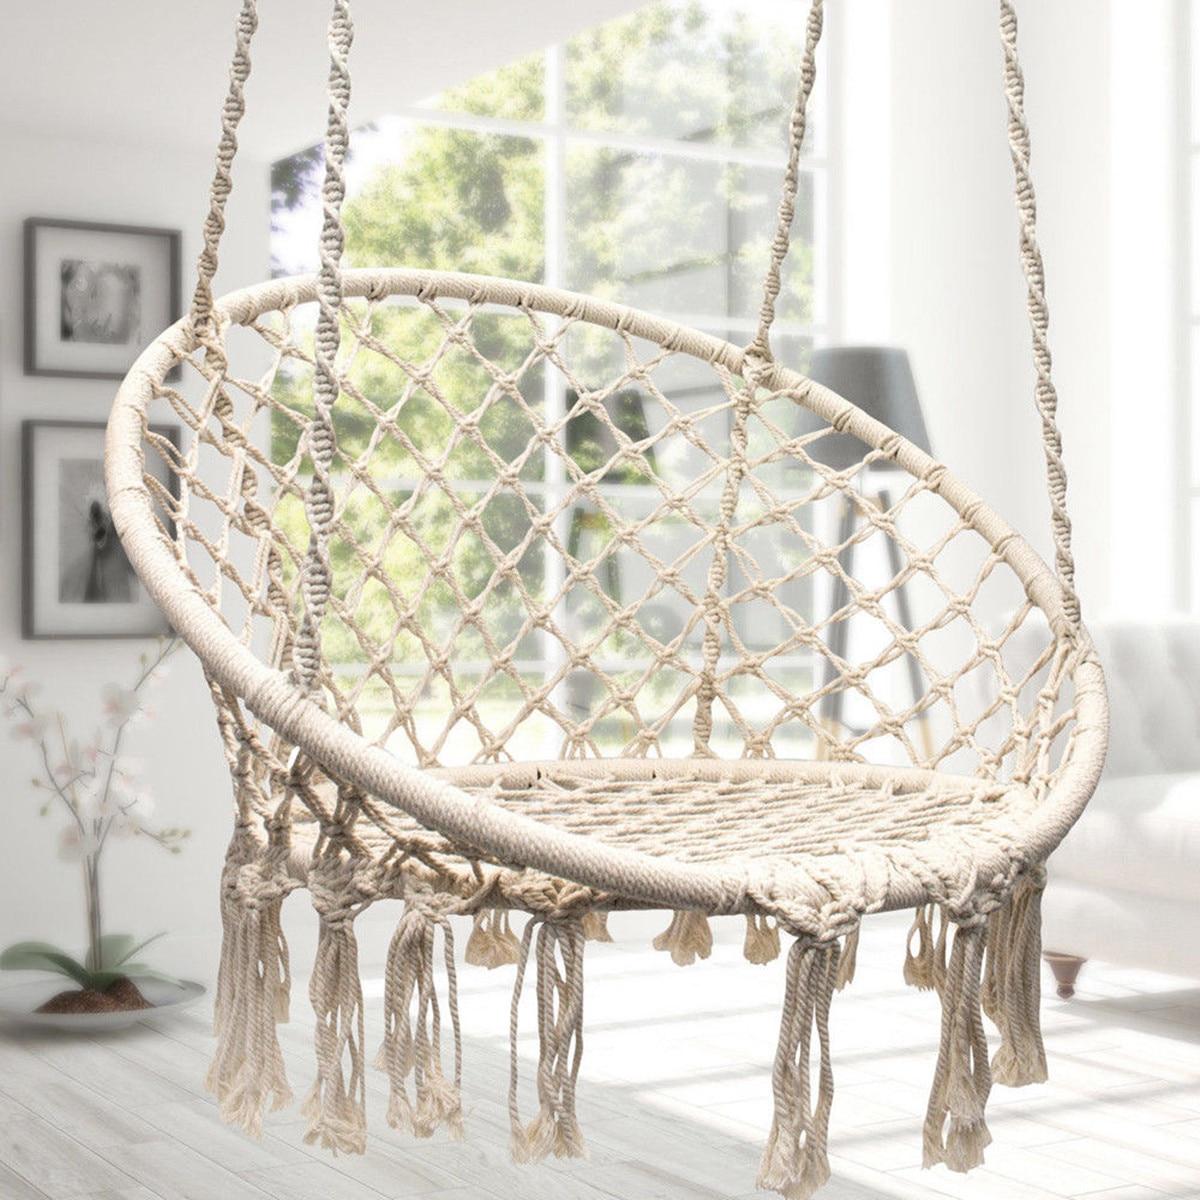 Nordic Round Hammock Outdoor Indoor Hammocks Chair Dormitory